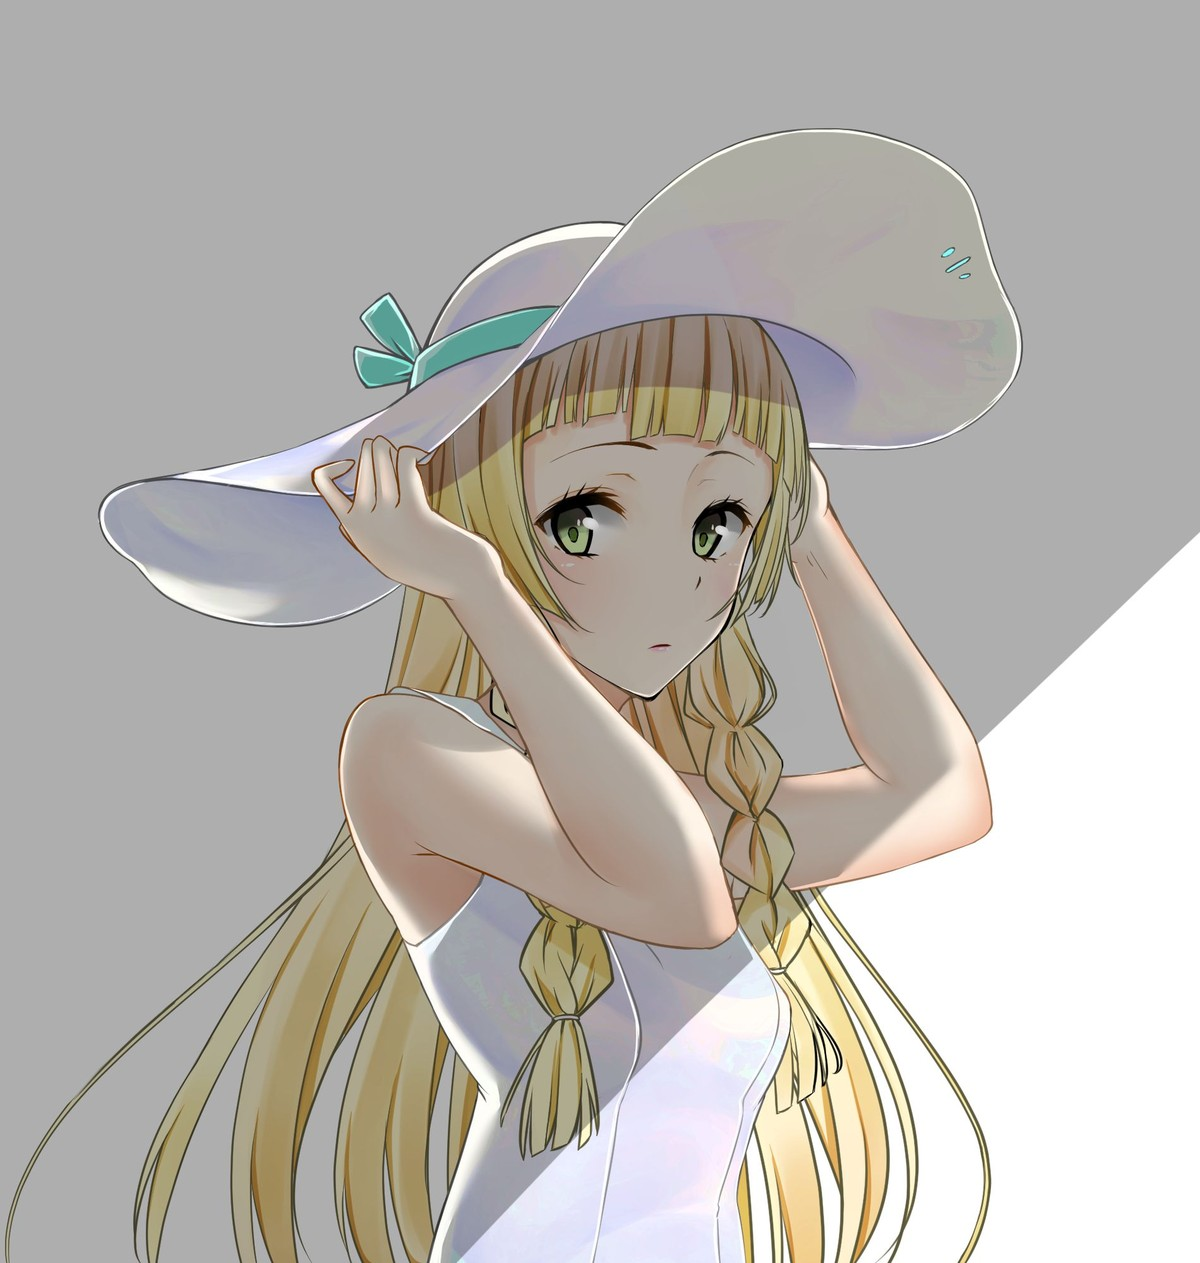 lillie_(pokemon)088